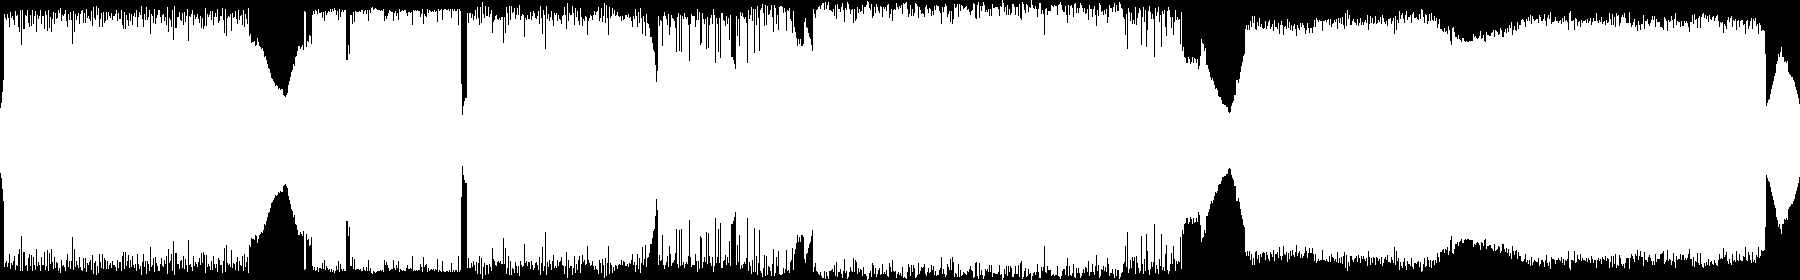 EDM Underworld audio waveform